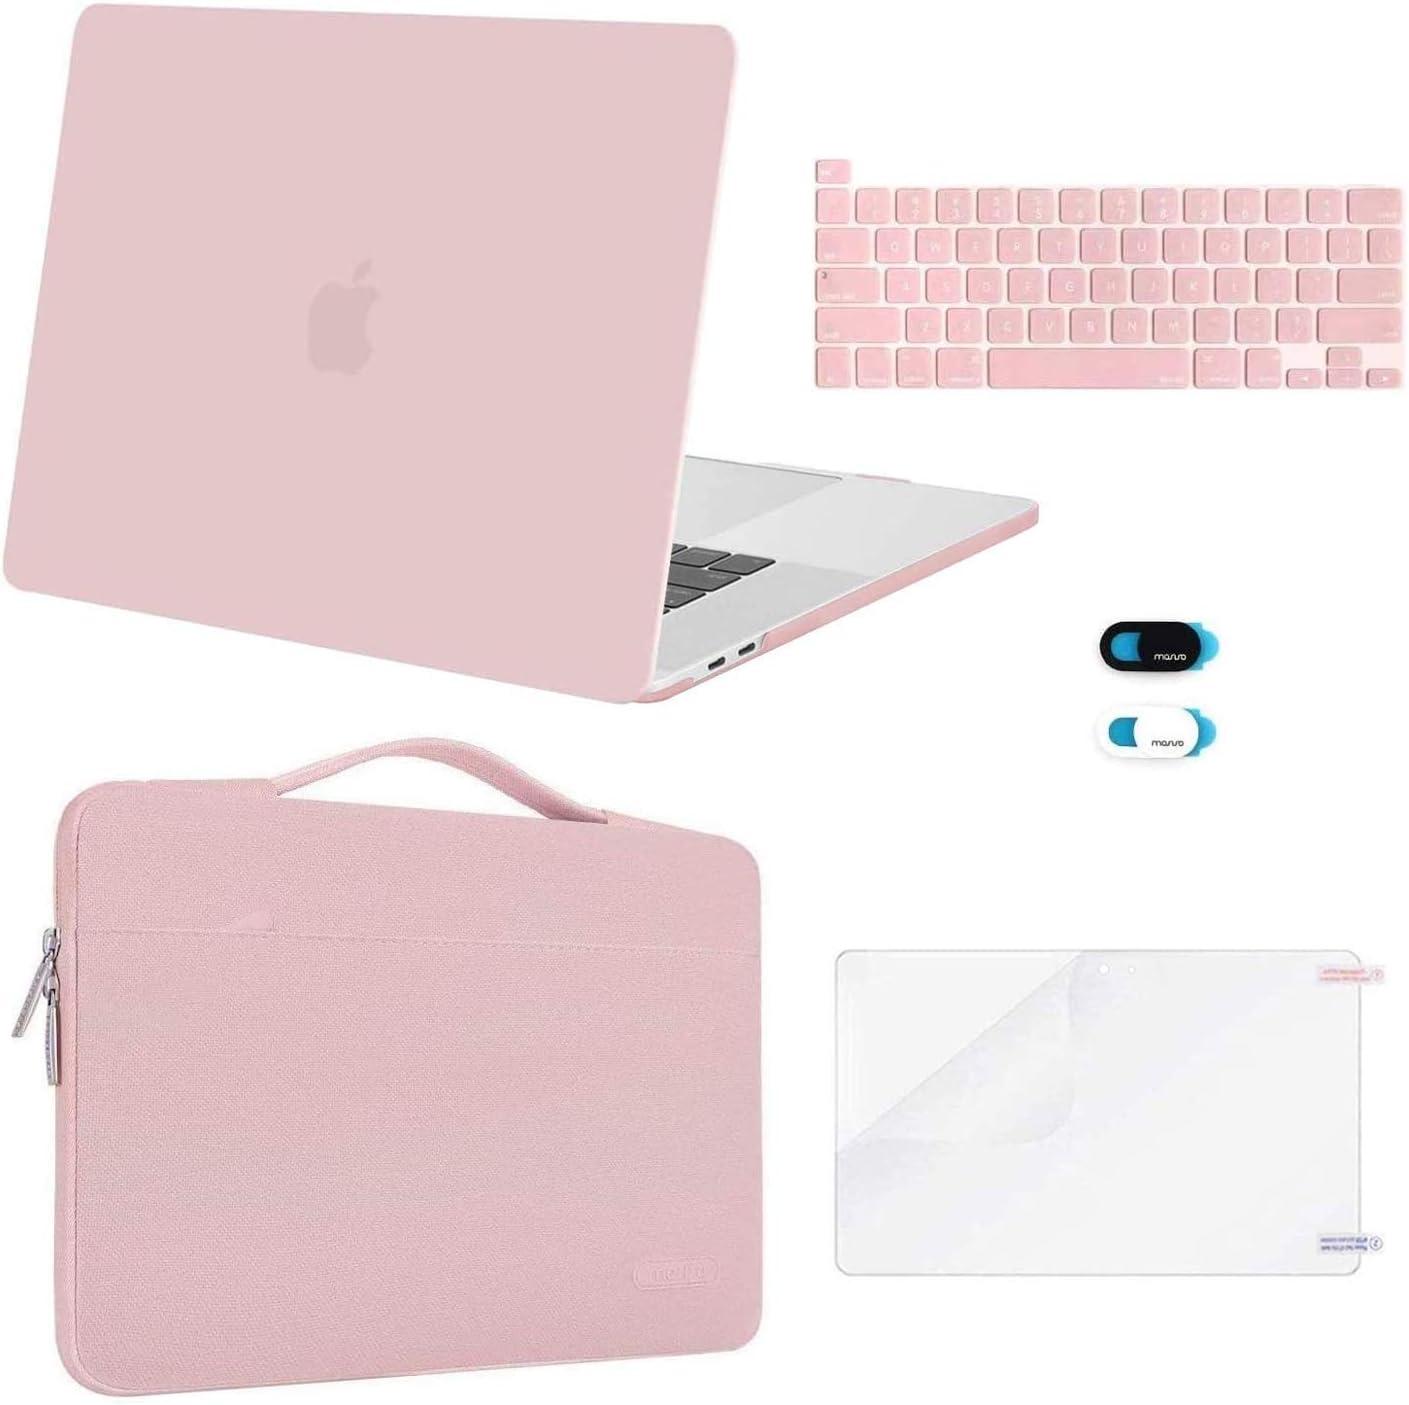 Stone Case Pro 16 Inch Cover 13 Macbook Air Case 2019 Minerals Macbook Pro 13 Inch Case 2018 Colorful Stone Macbook Pro 15 Inch Case EC0158